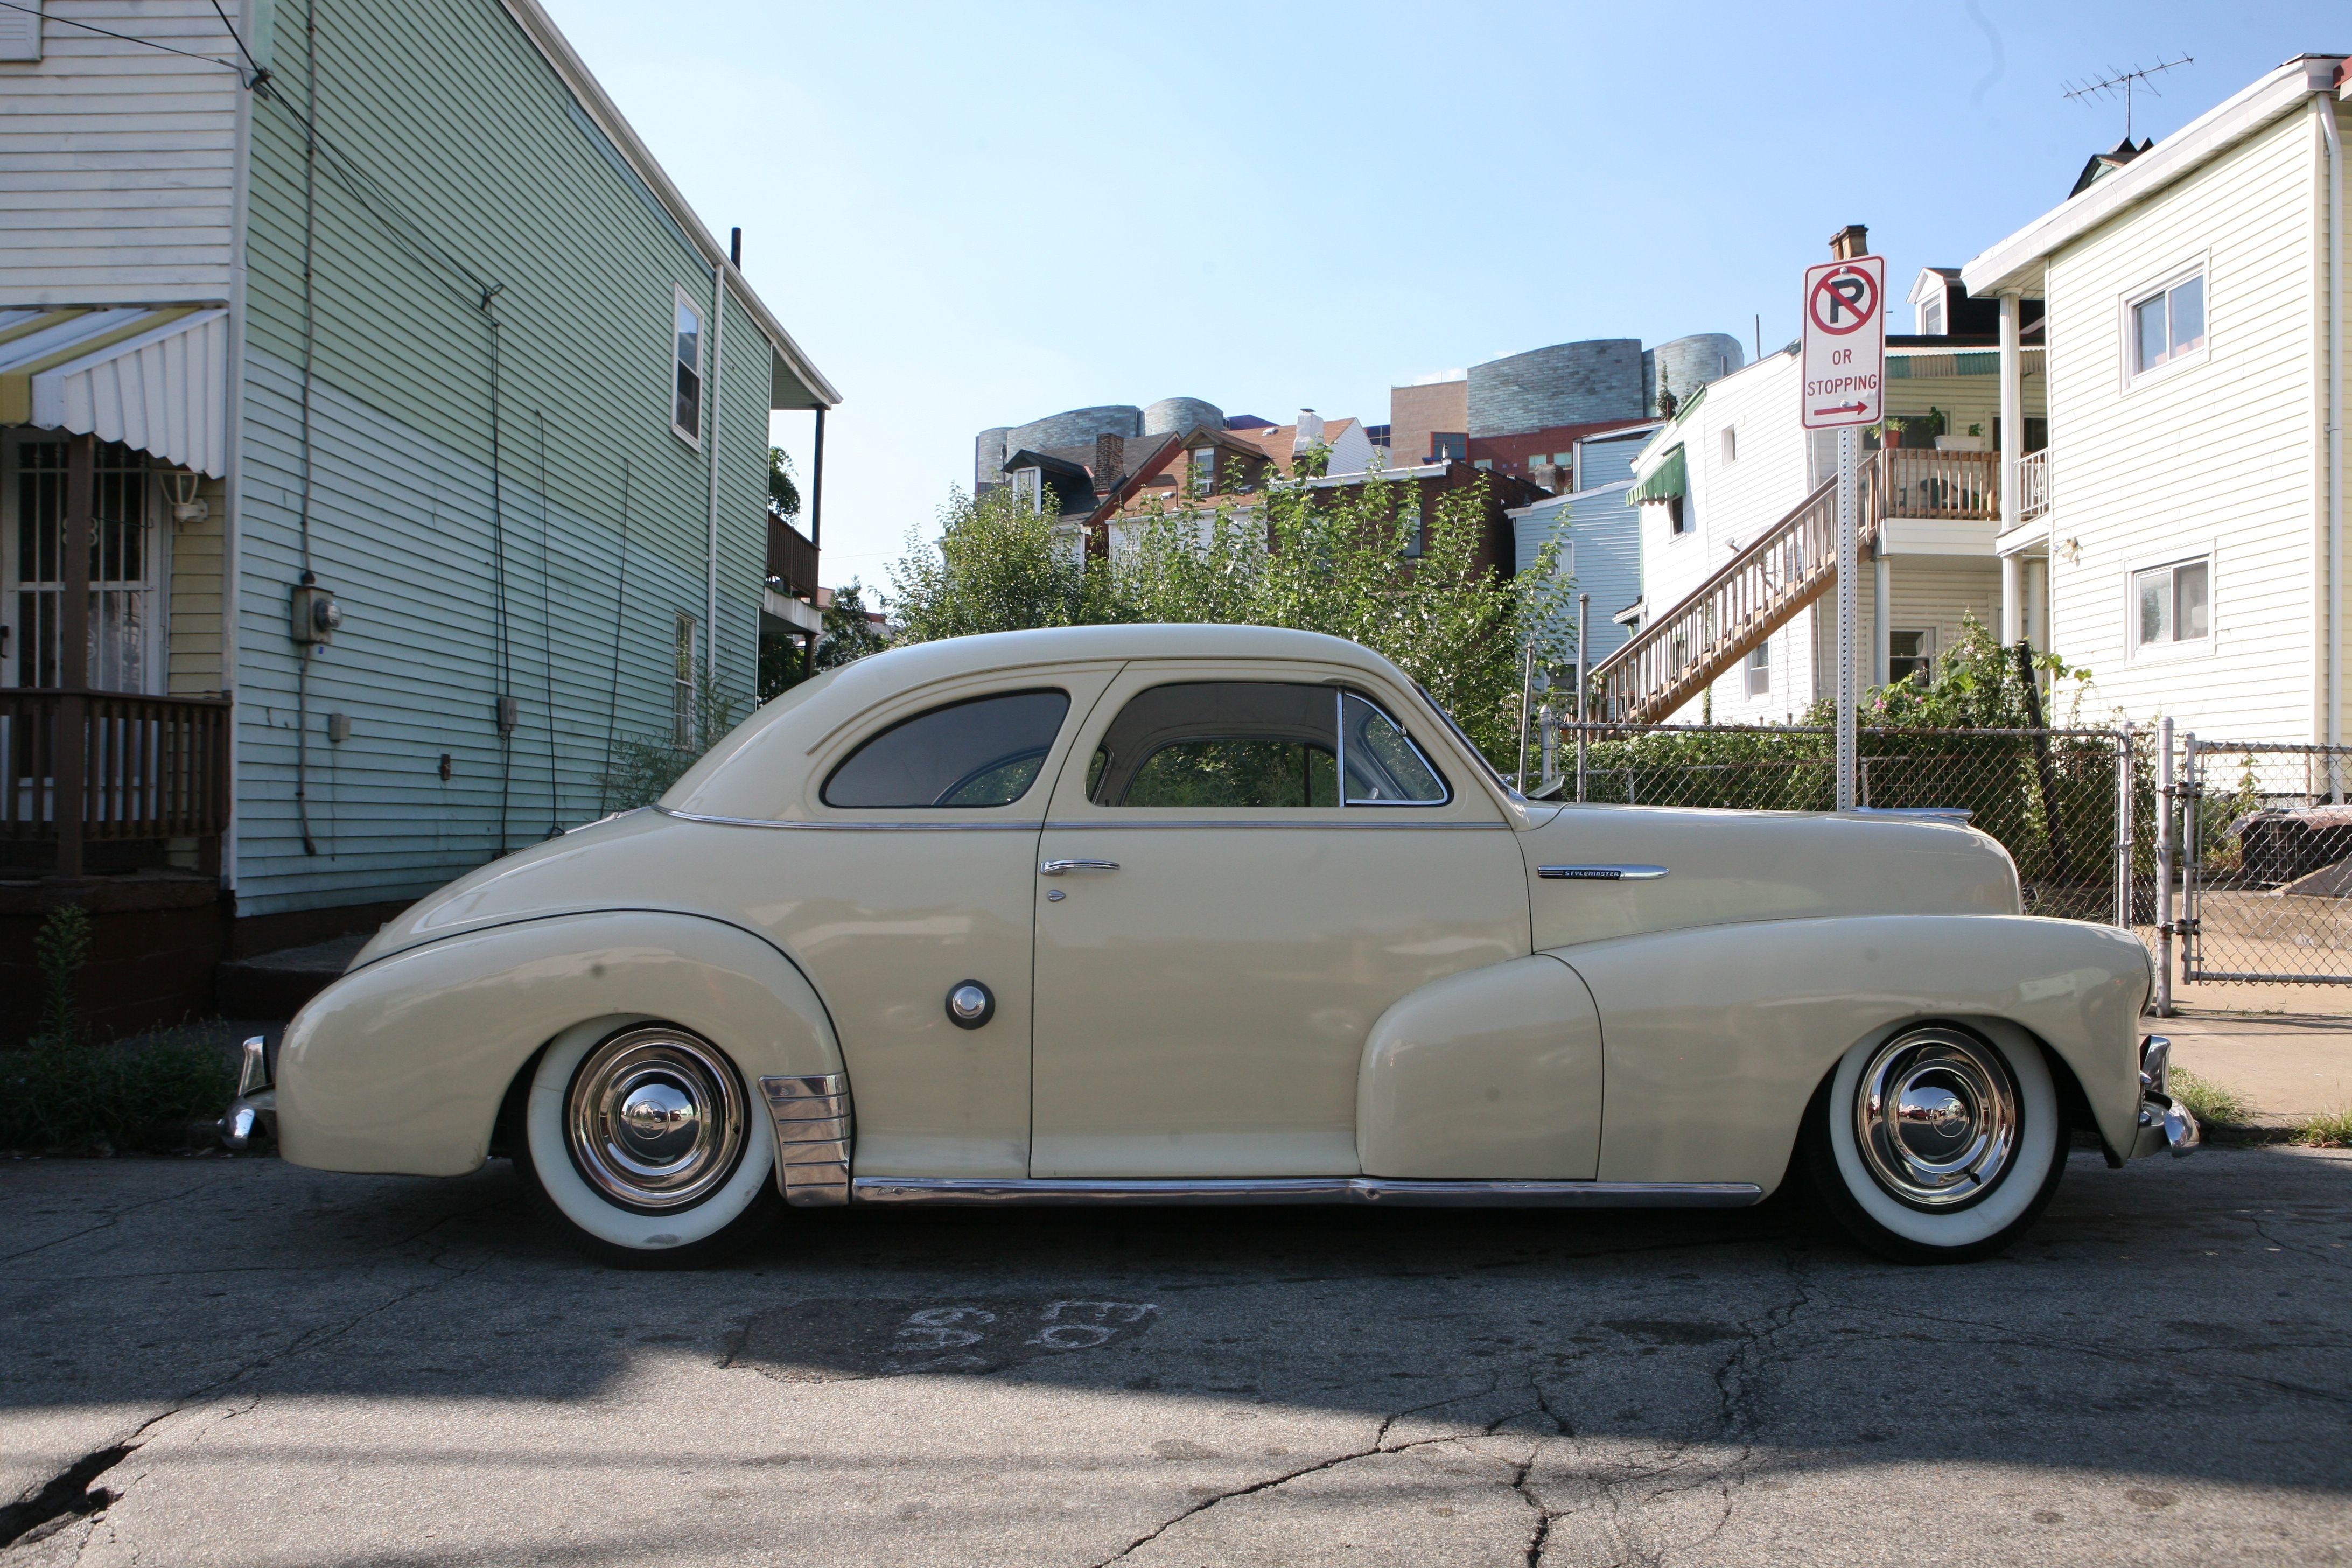 vintage car side view - Google Search | vintage vehicles | Pinterest ...